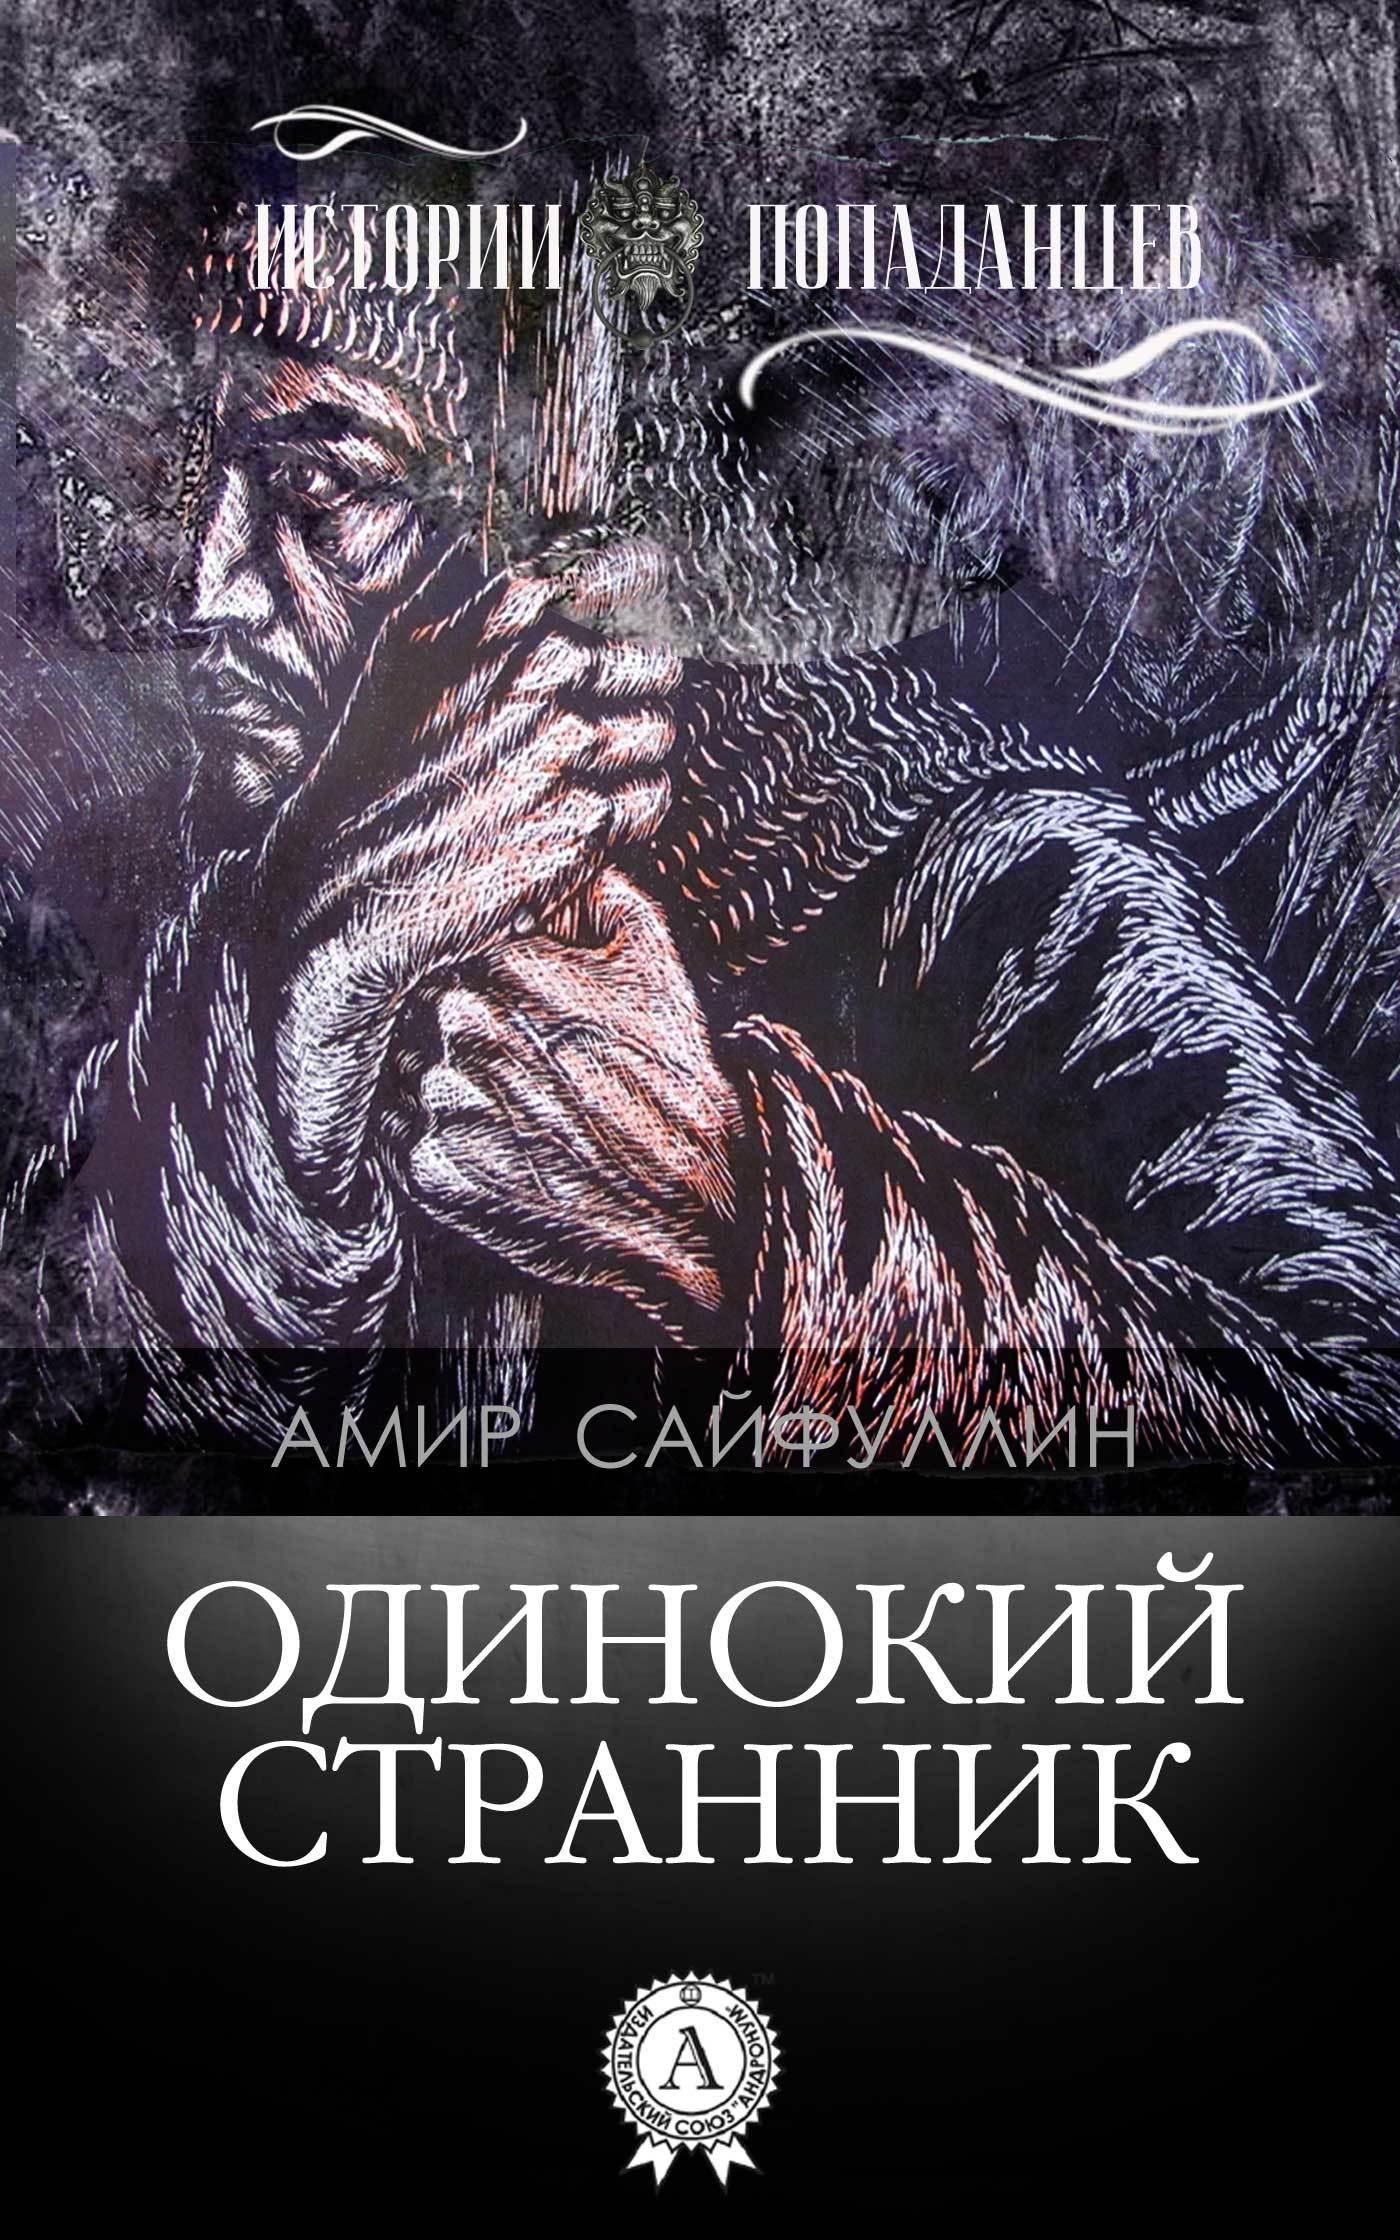 Амир Сайфуллин Одинокий странник цена и фото